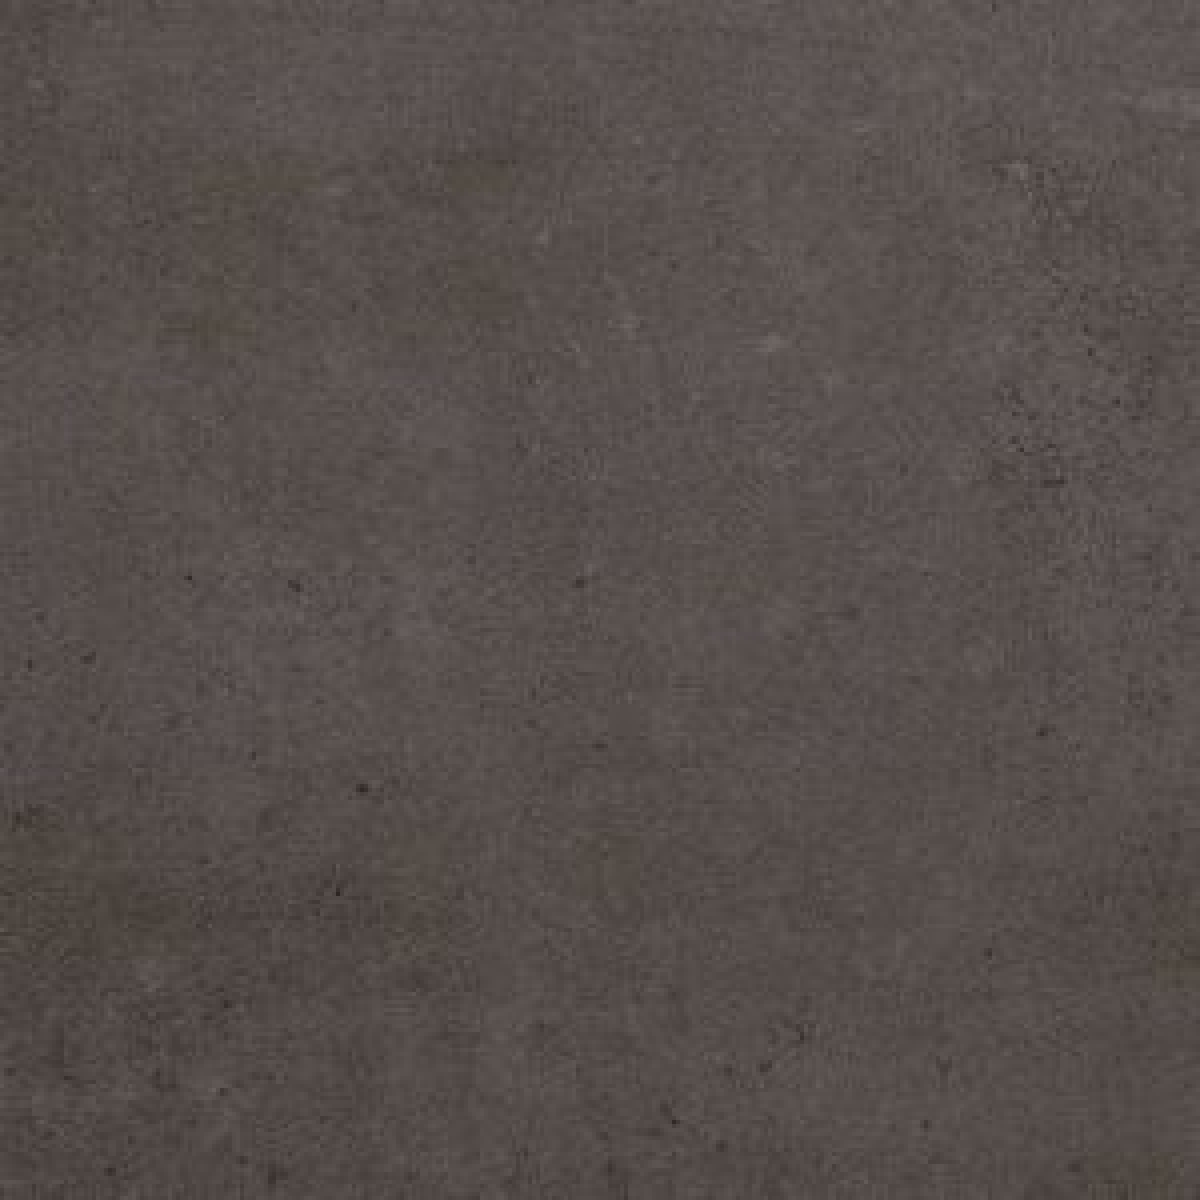 RAK Surface Charcoal Lappato Tile 750 x 750mm